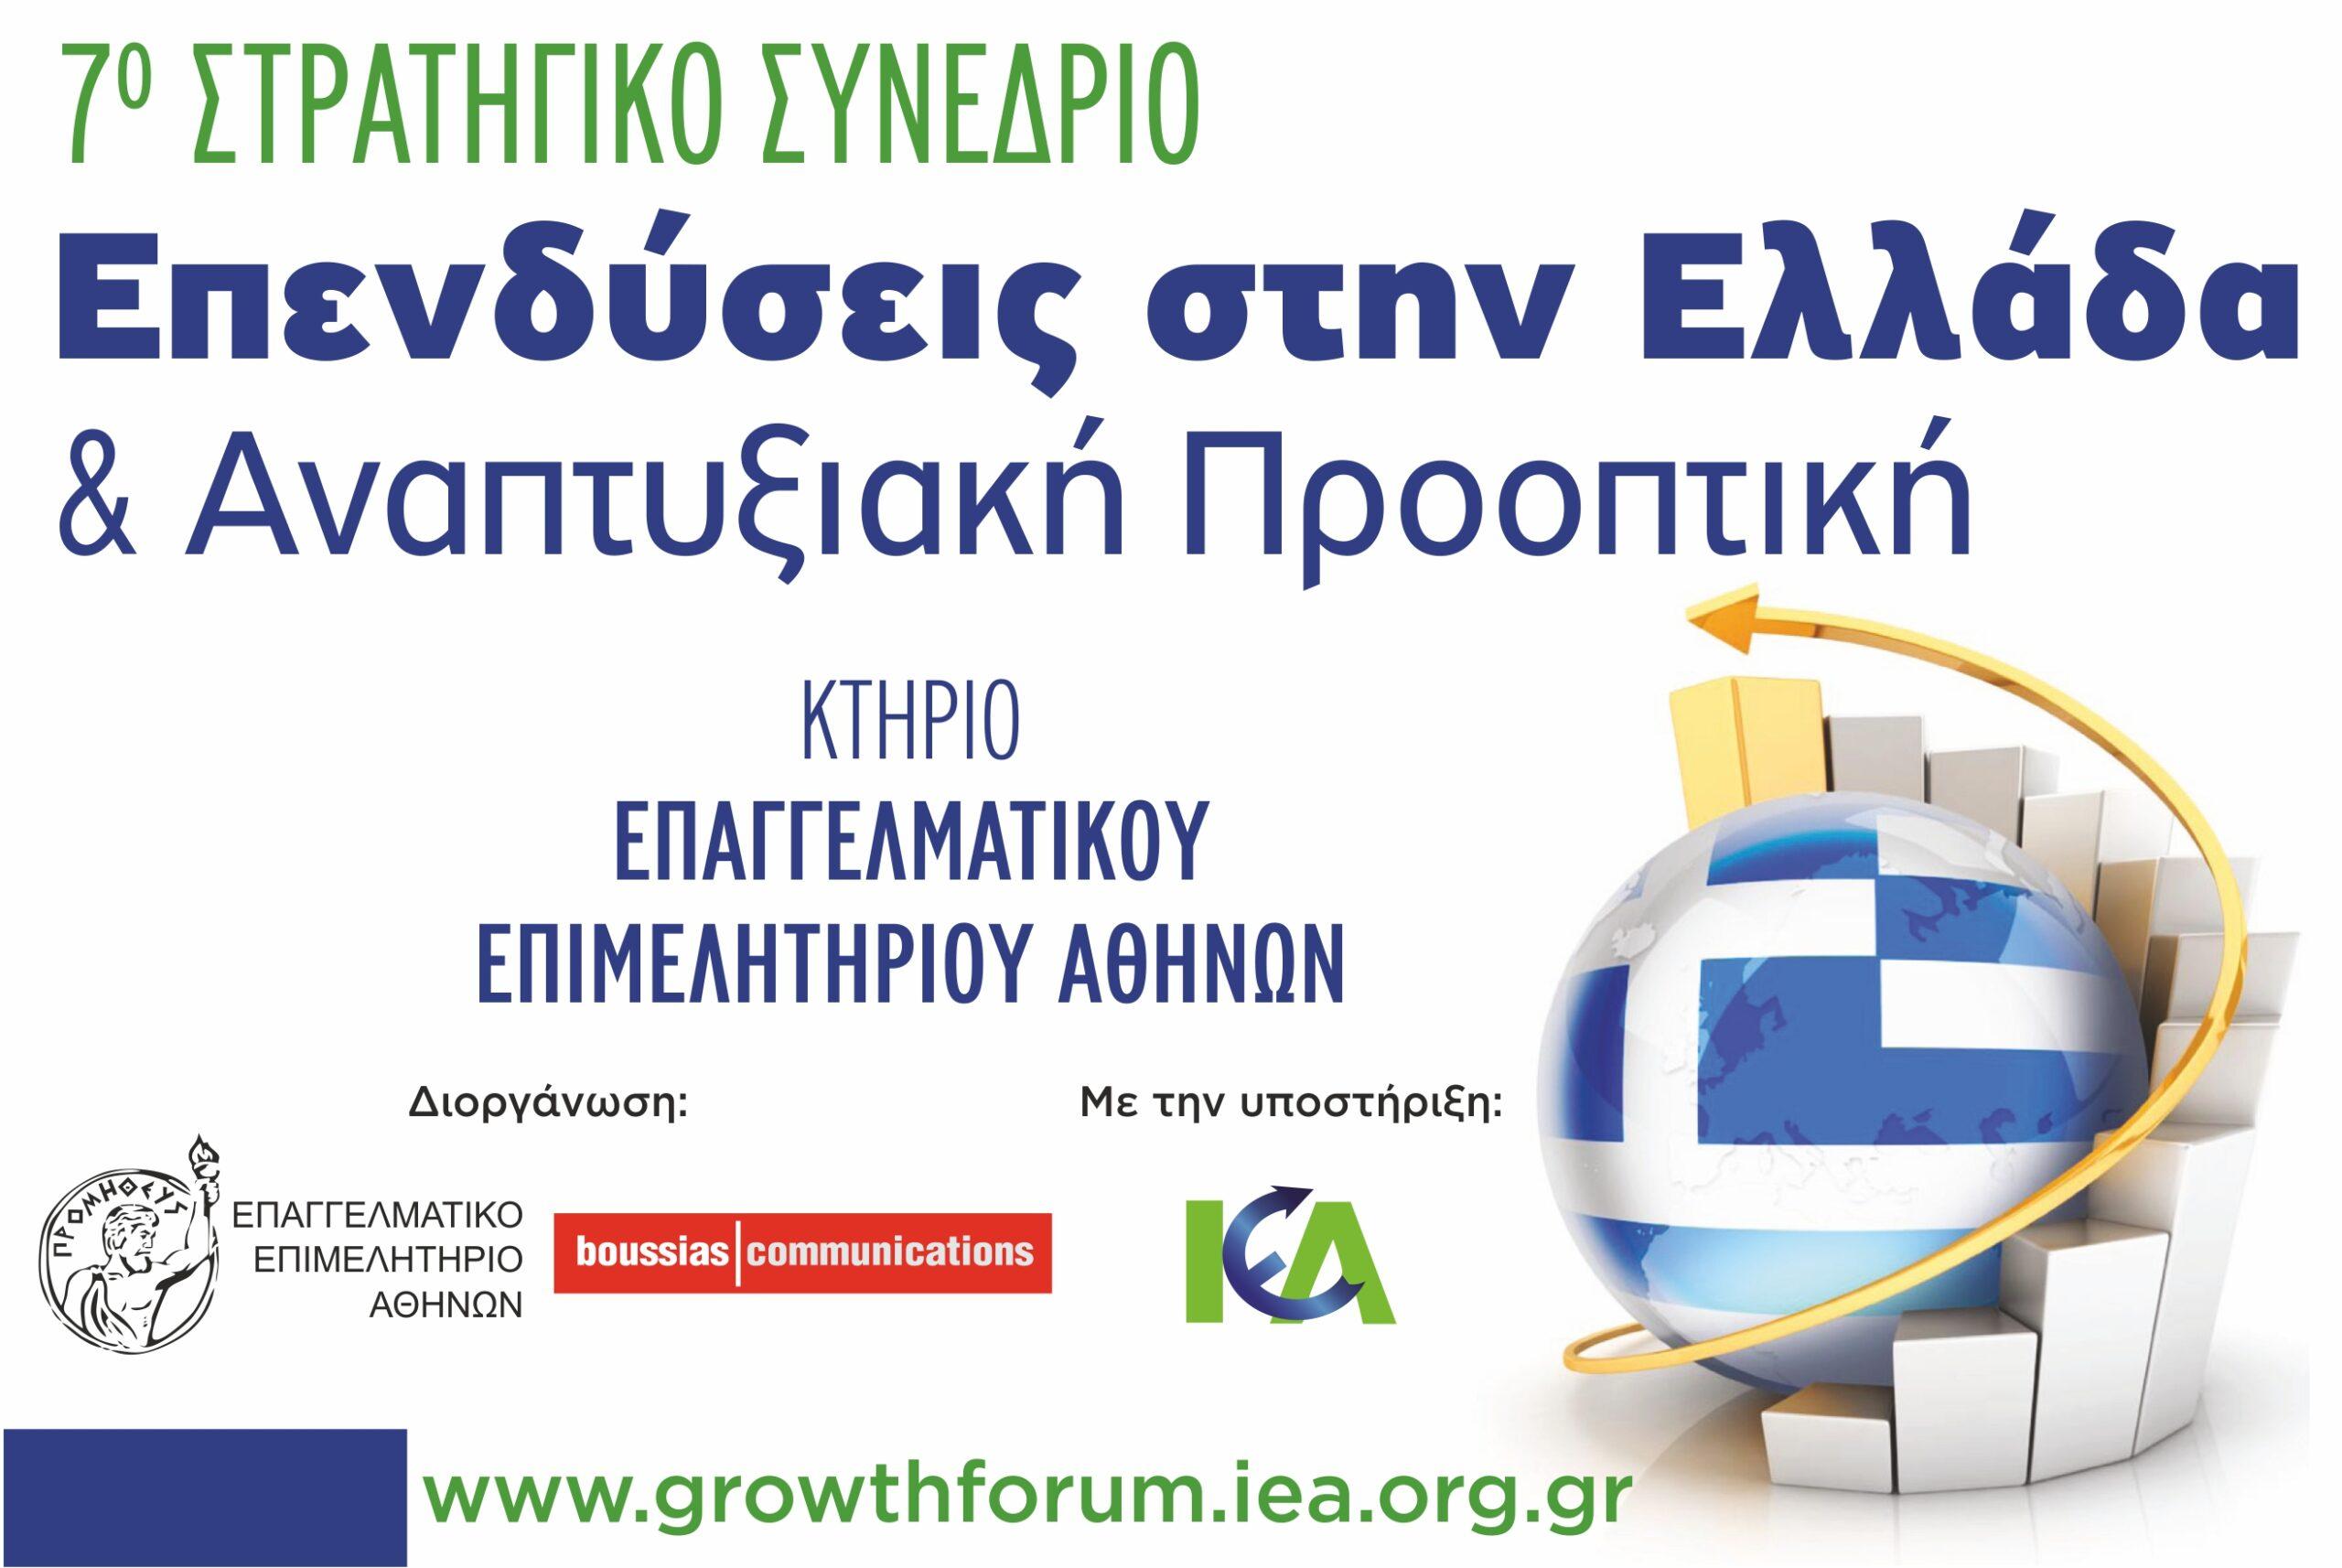 IEA Επενδύσεις στην Ελλάδα & Αναπτυξιακή Προοπτική - 2020